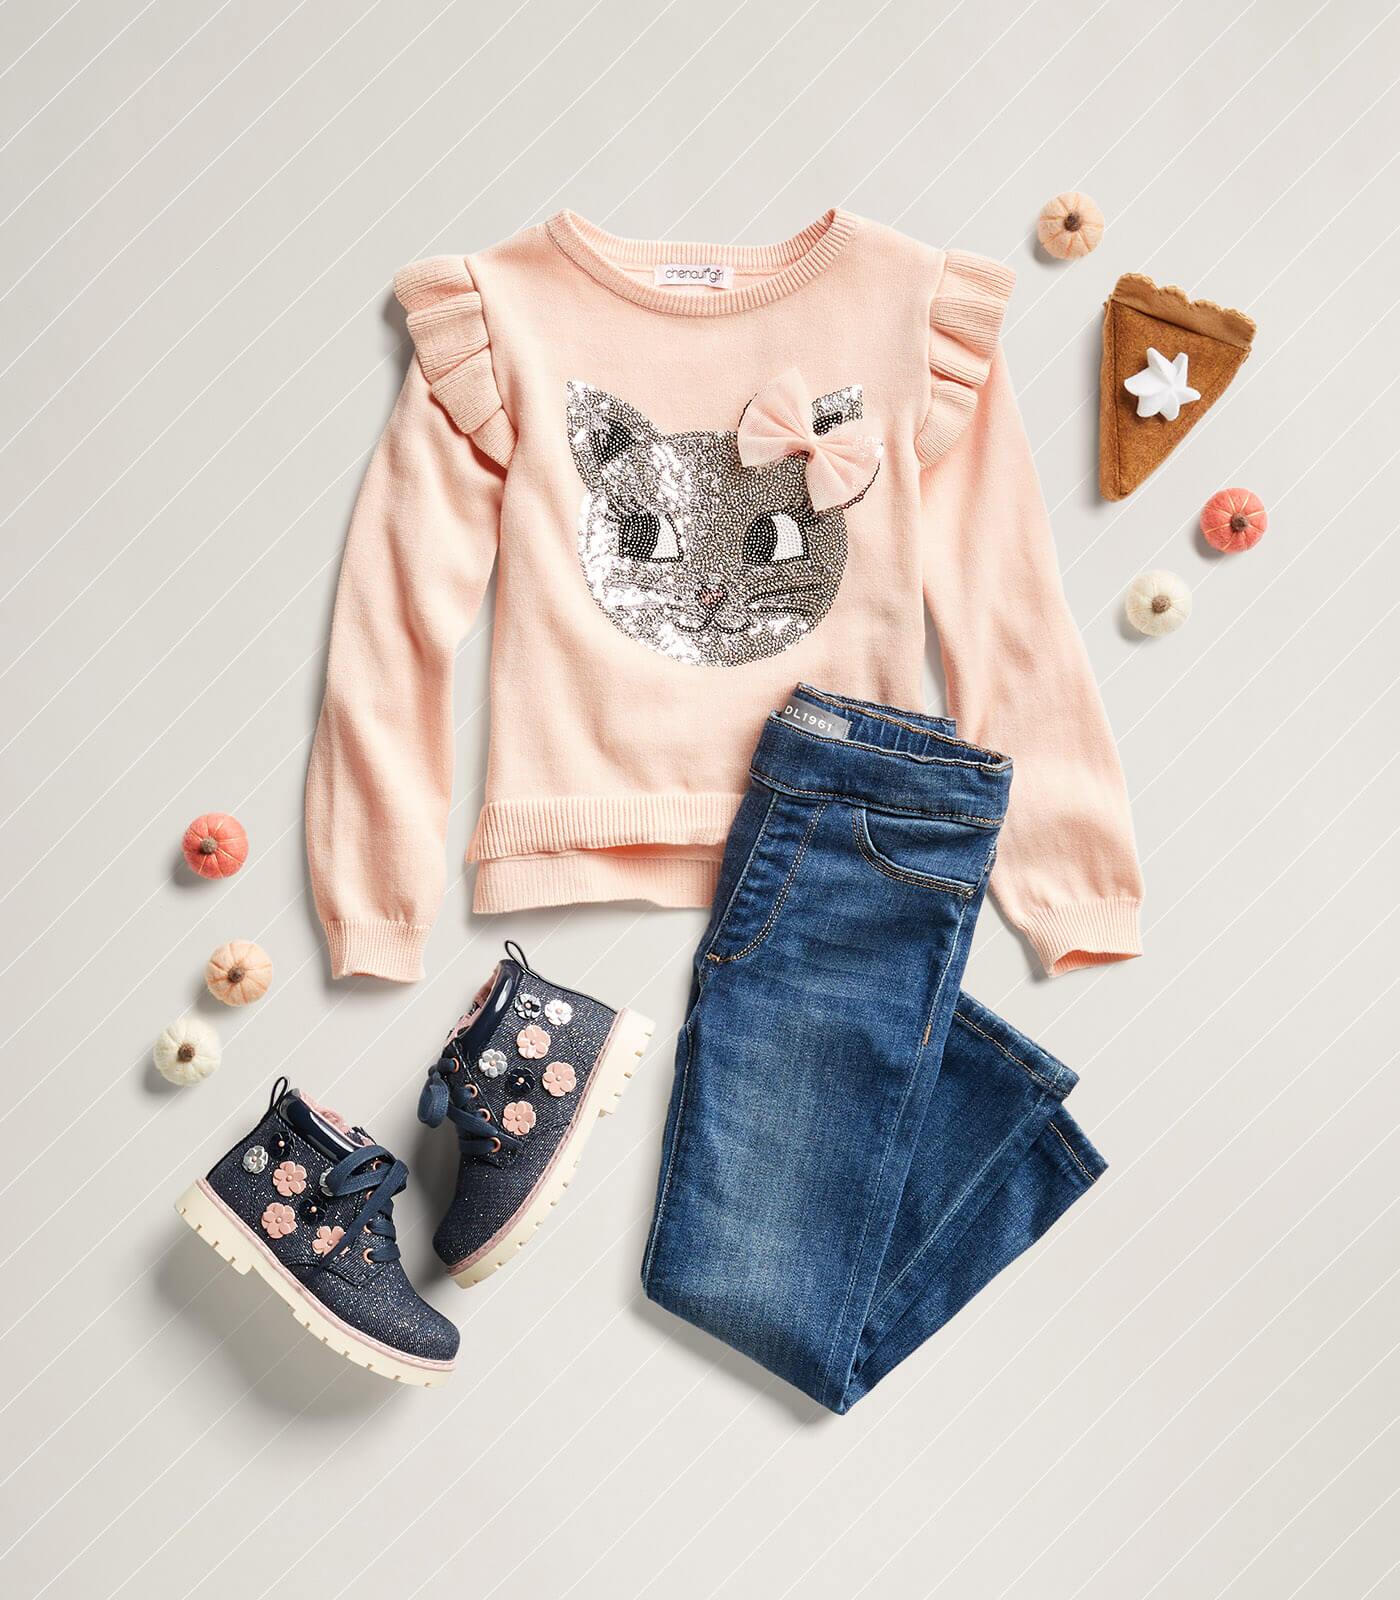 cat sweatshirt and jeans